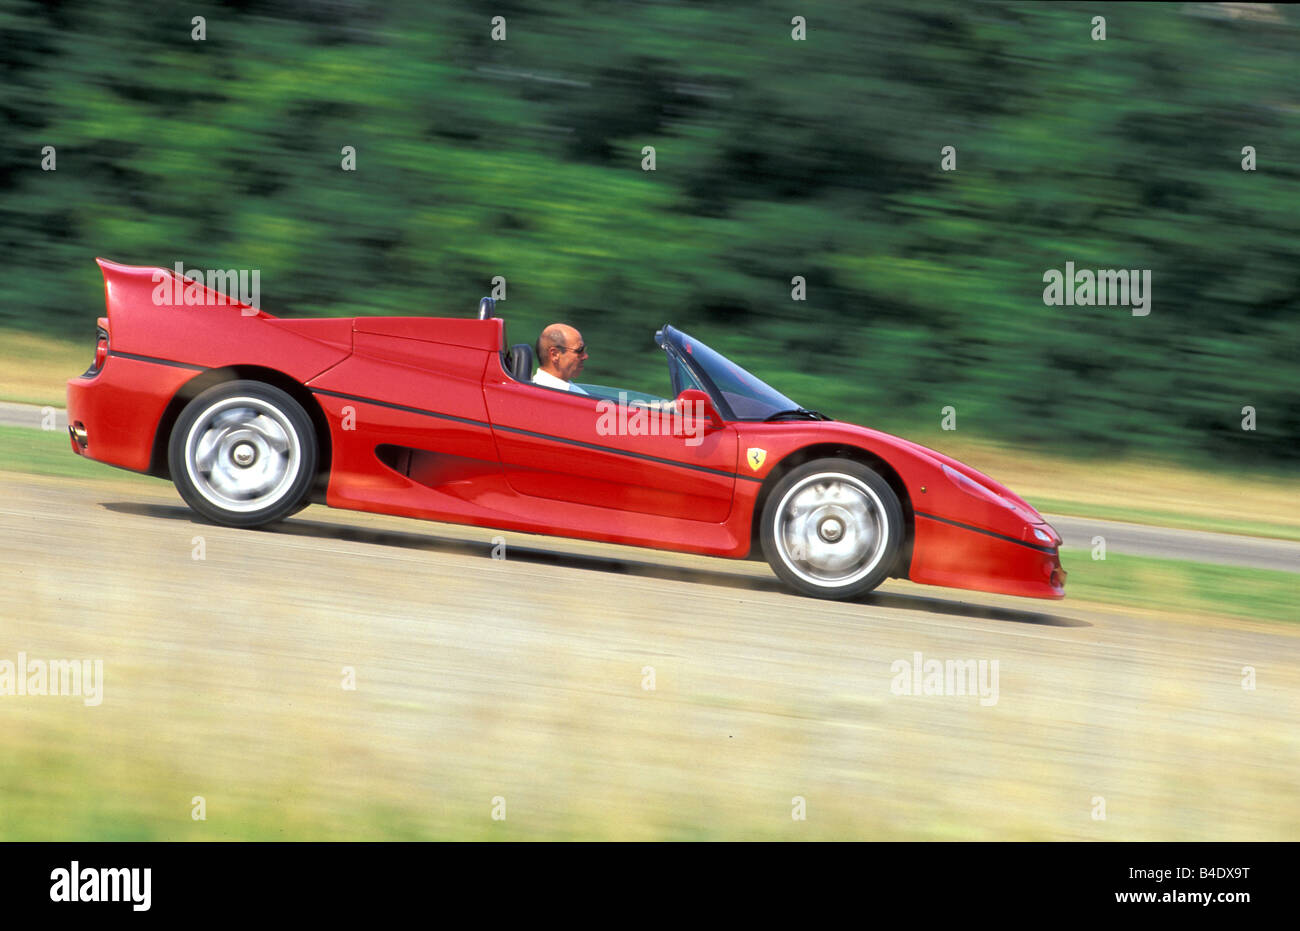 Car ferrari f50 model year 1995 2002 red roadster convertible car ferrari f50 model year 1995 2002 red roadster convertible vanachro Choice Image